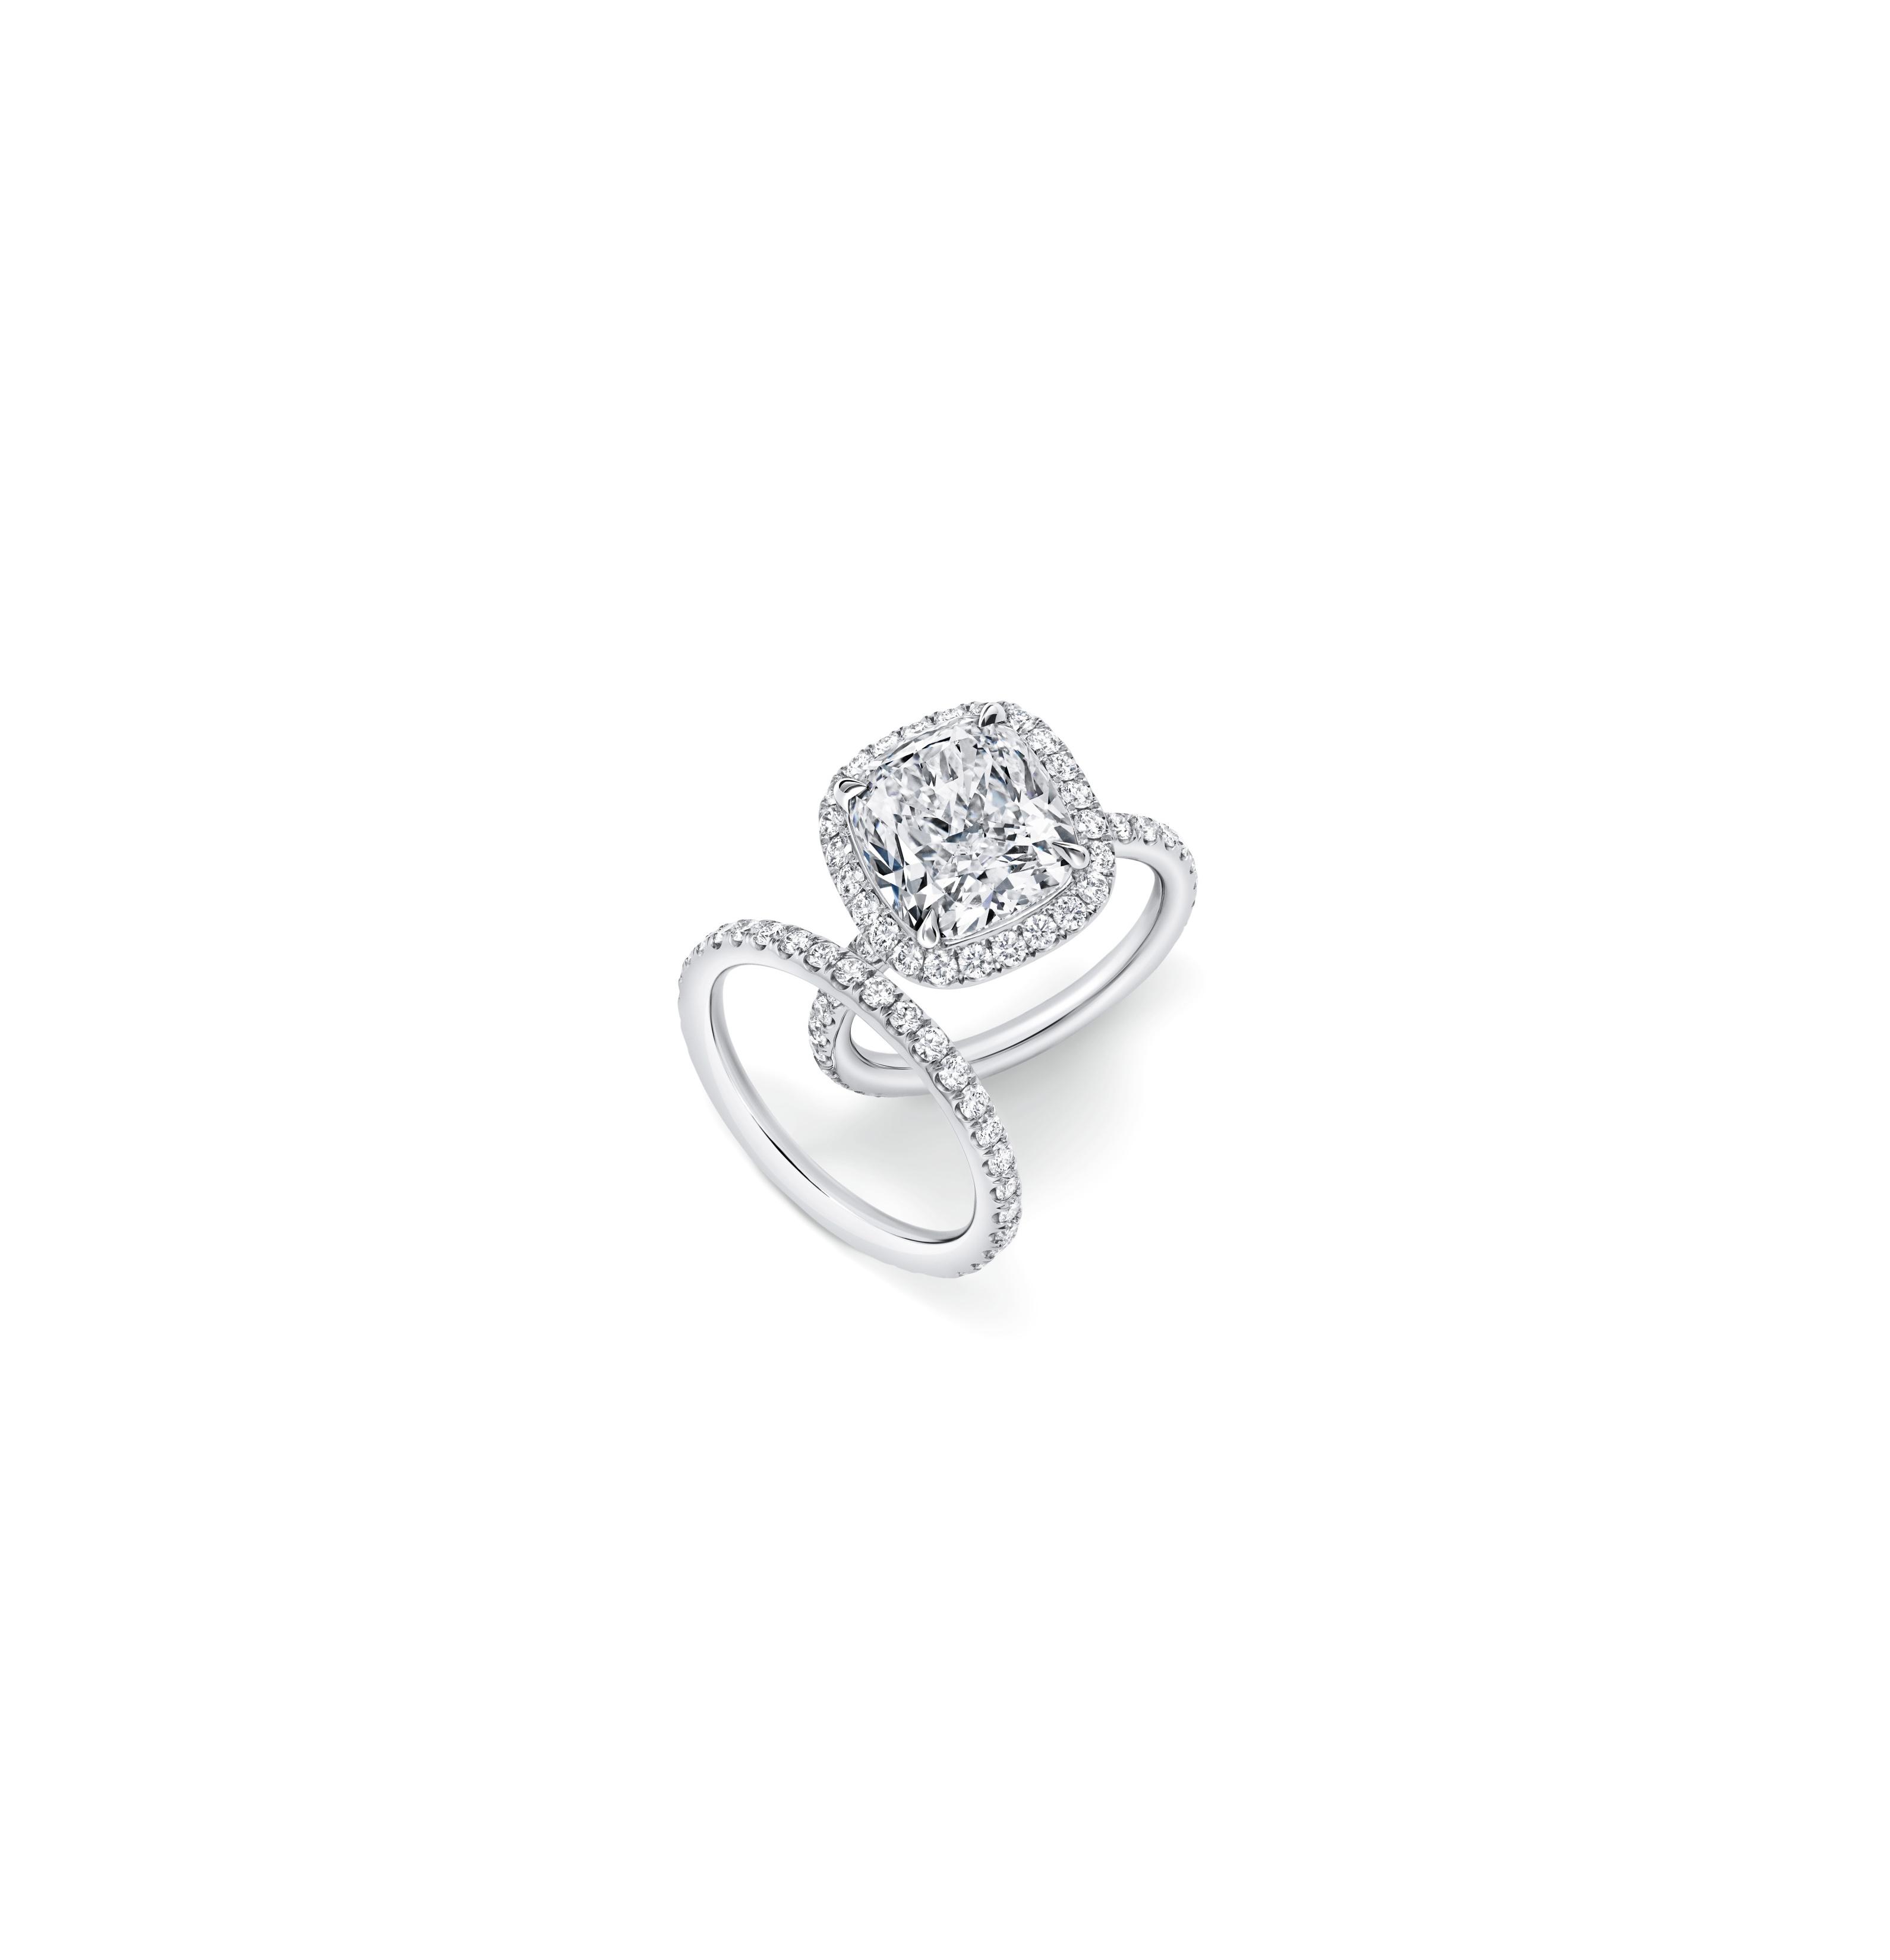 harry winston cushion cut diamond engagement ring micropave band